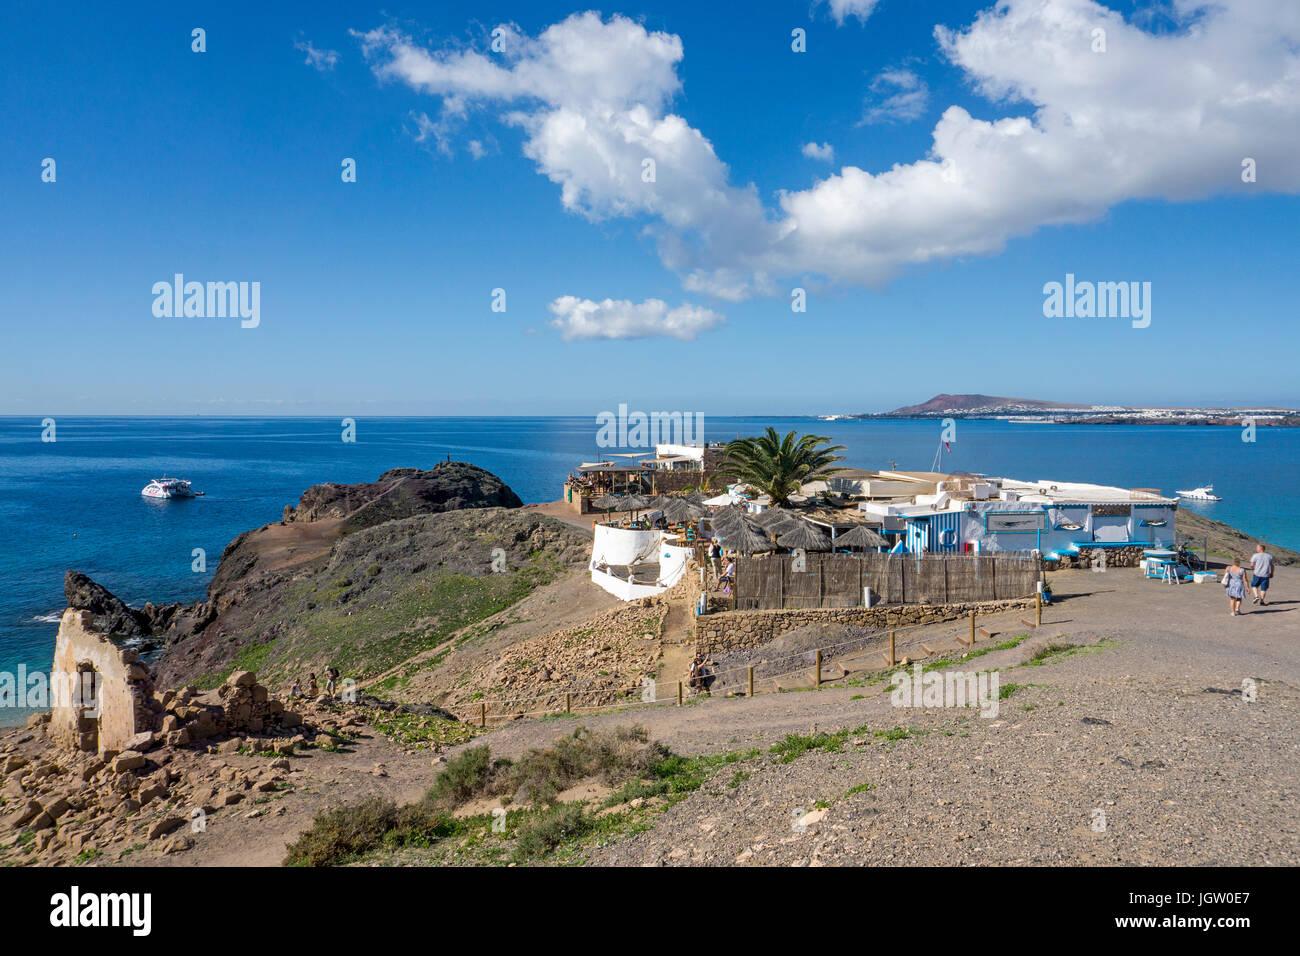 Gastronomy at Playa de Papagayo, Punta Papagayo, Playa Blanca, Lanzarote island, Canary islands, Spain, Europe - Stock Image